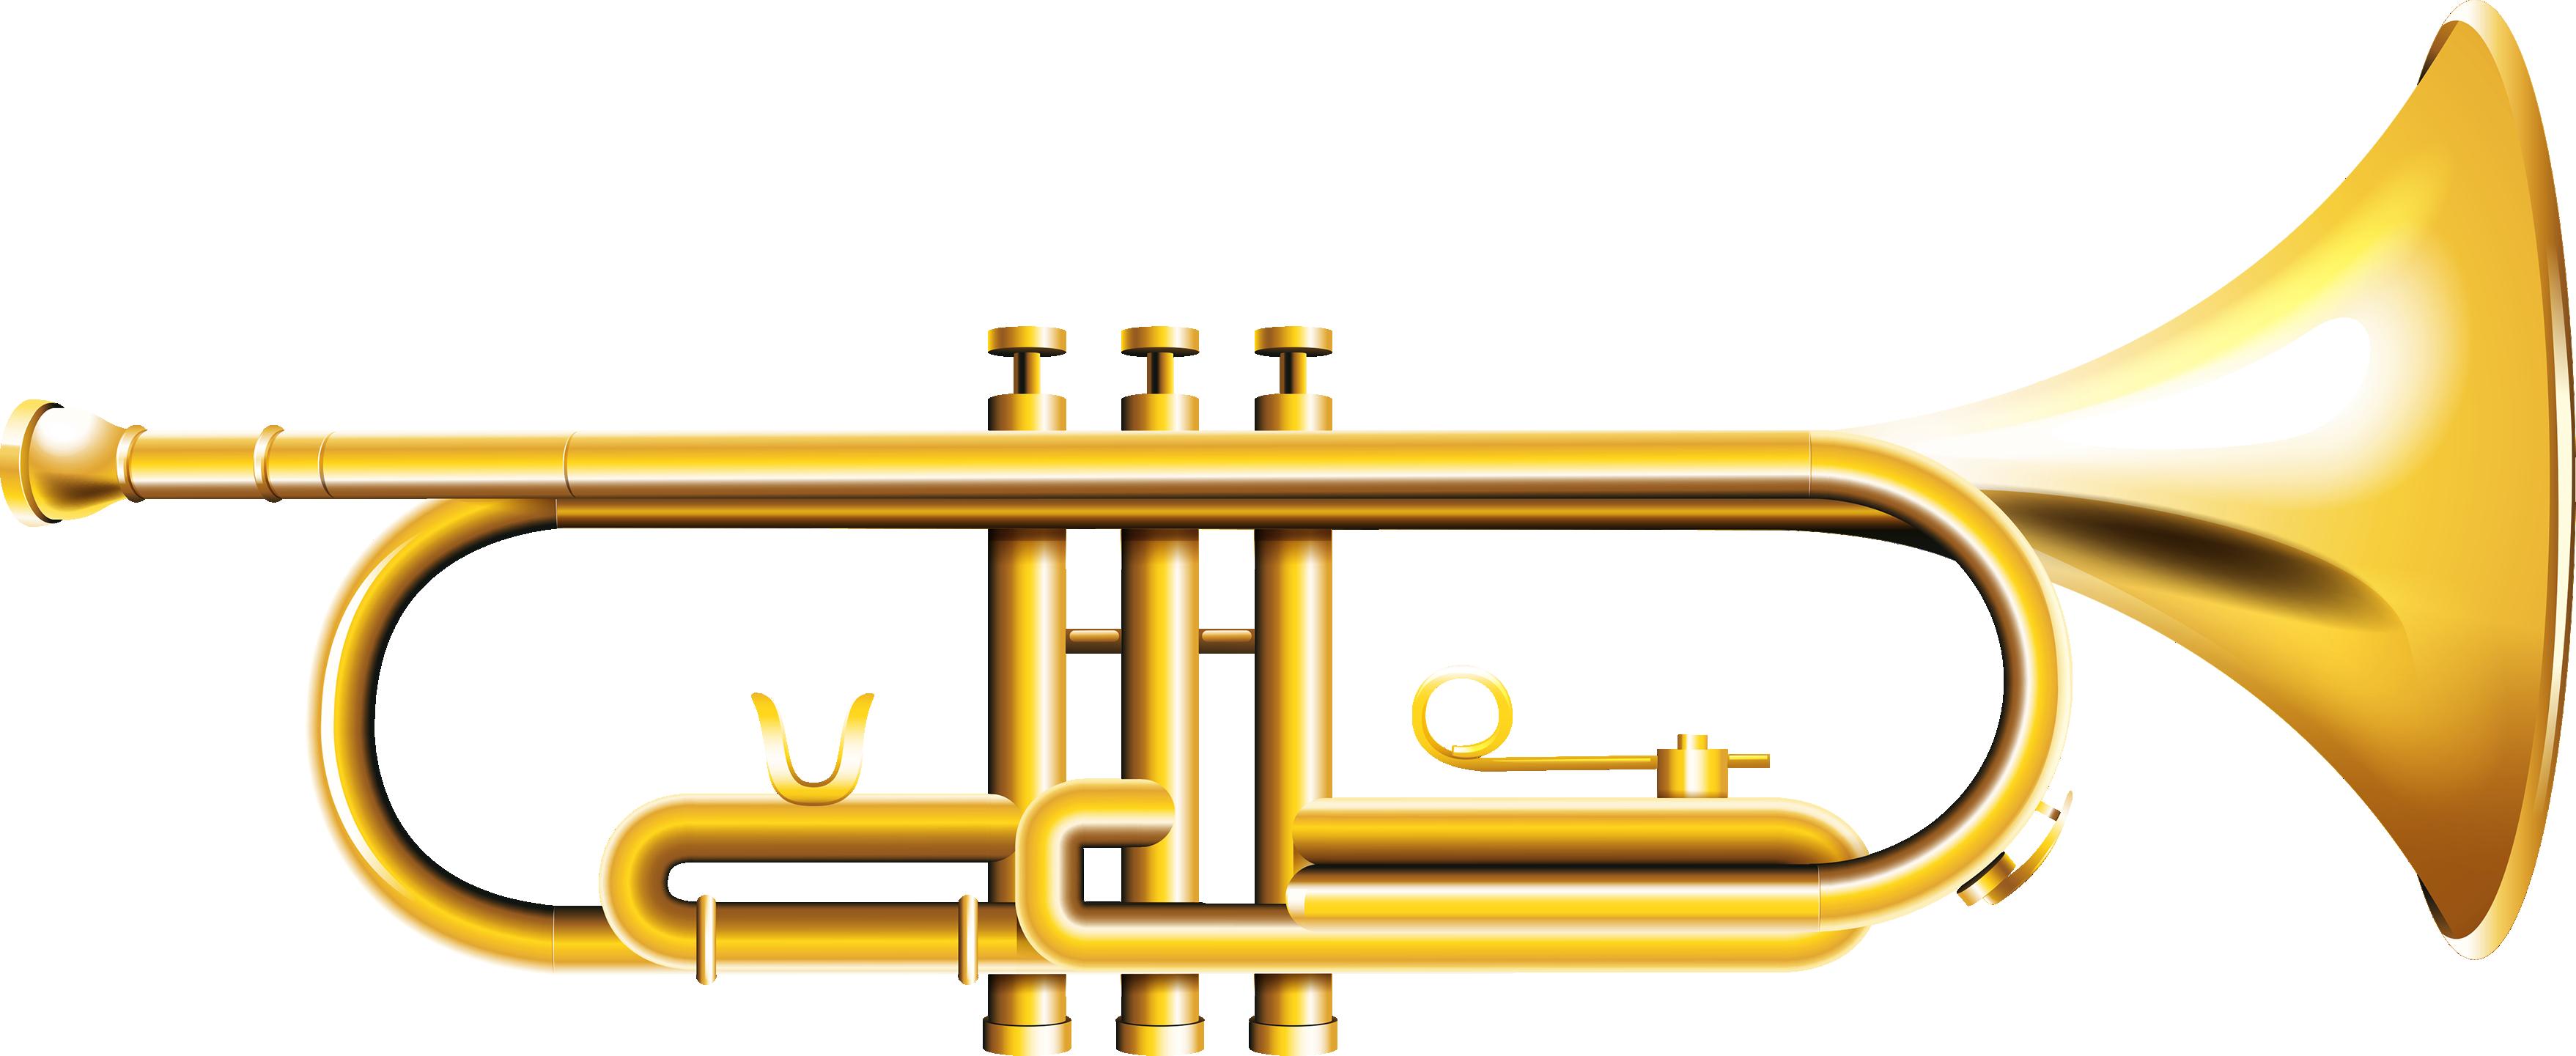 Trumpet PNG images free download, Saxophone PNG jpg freeuse download